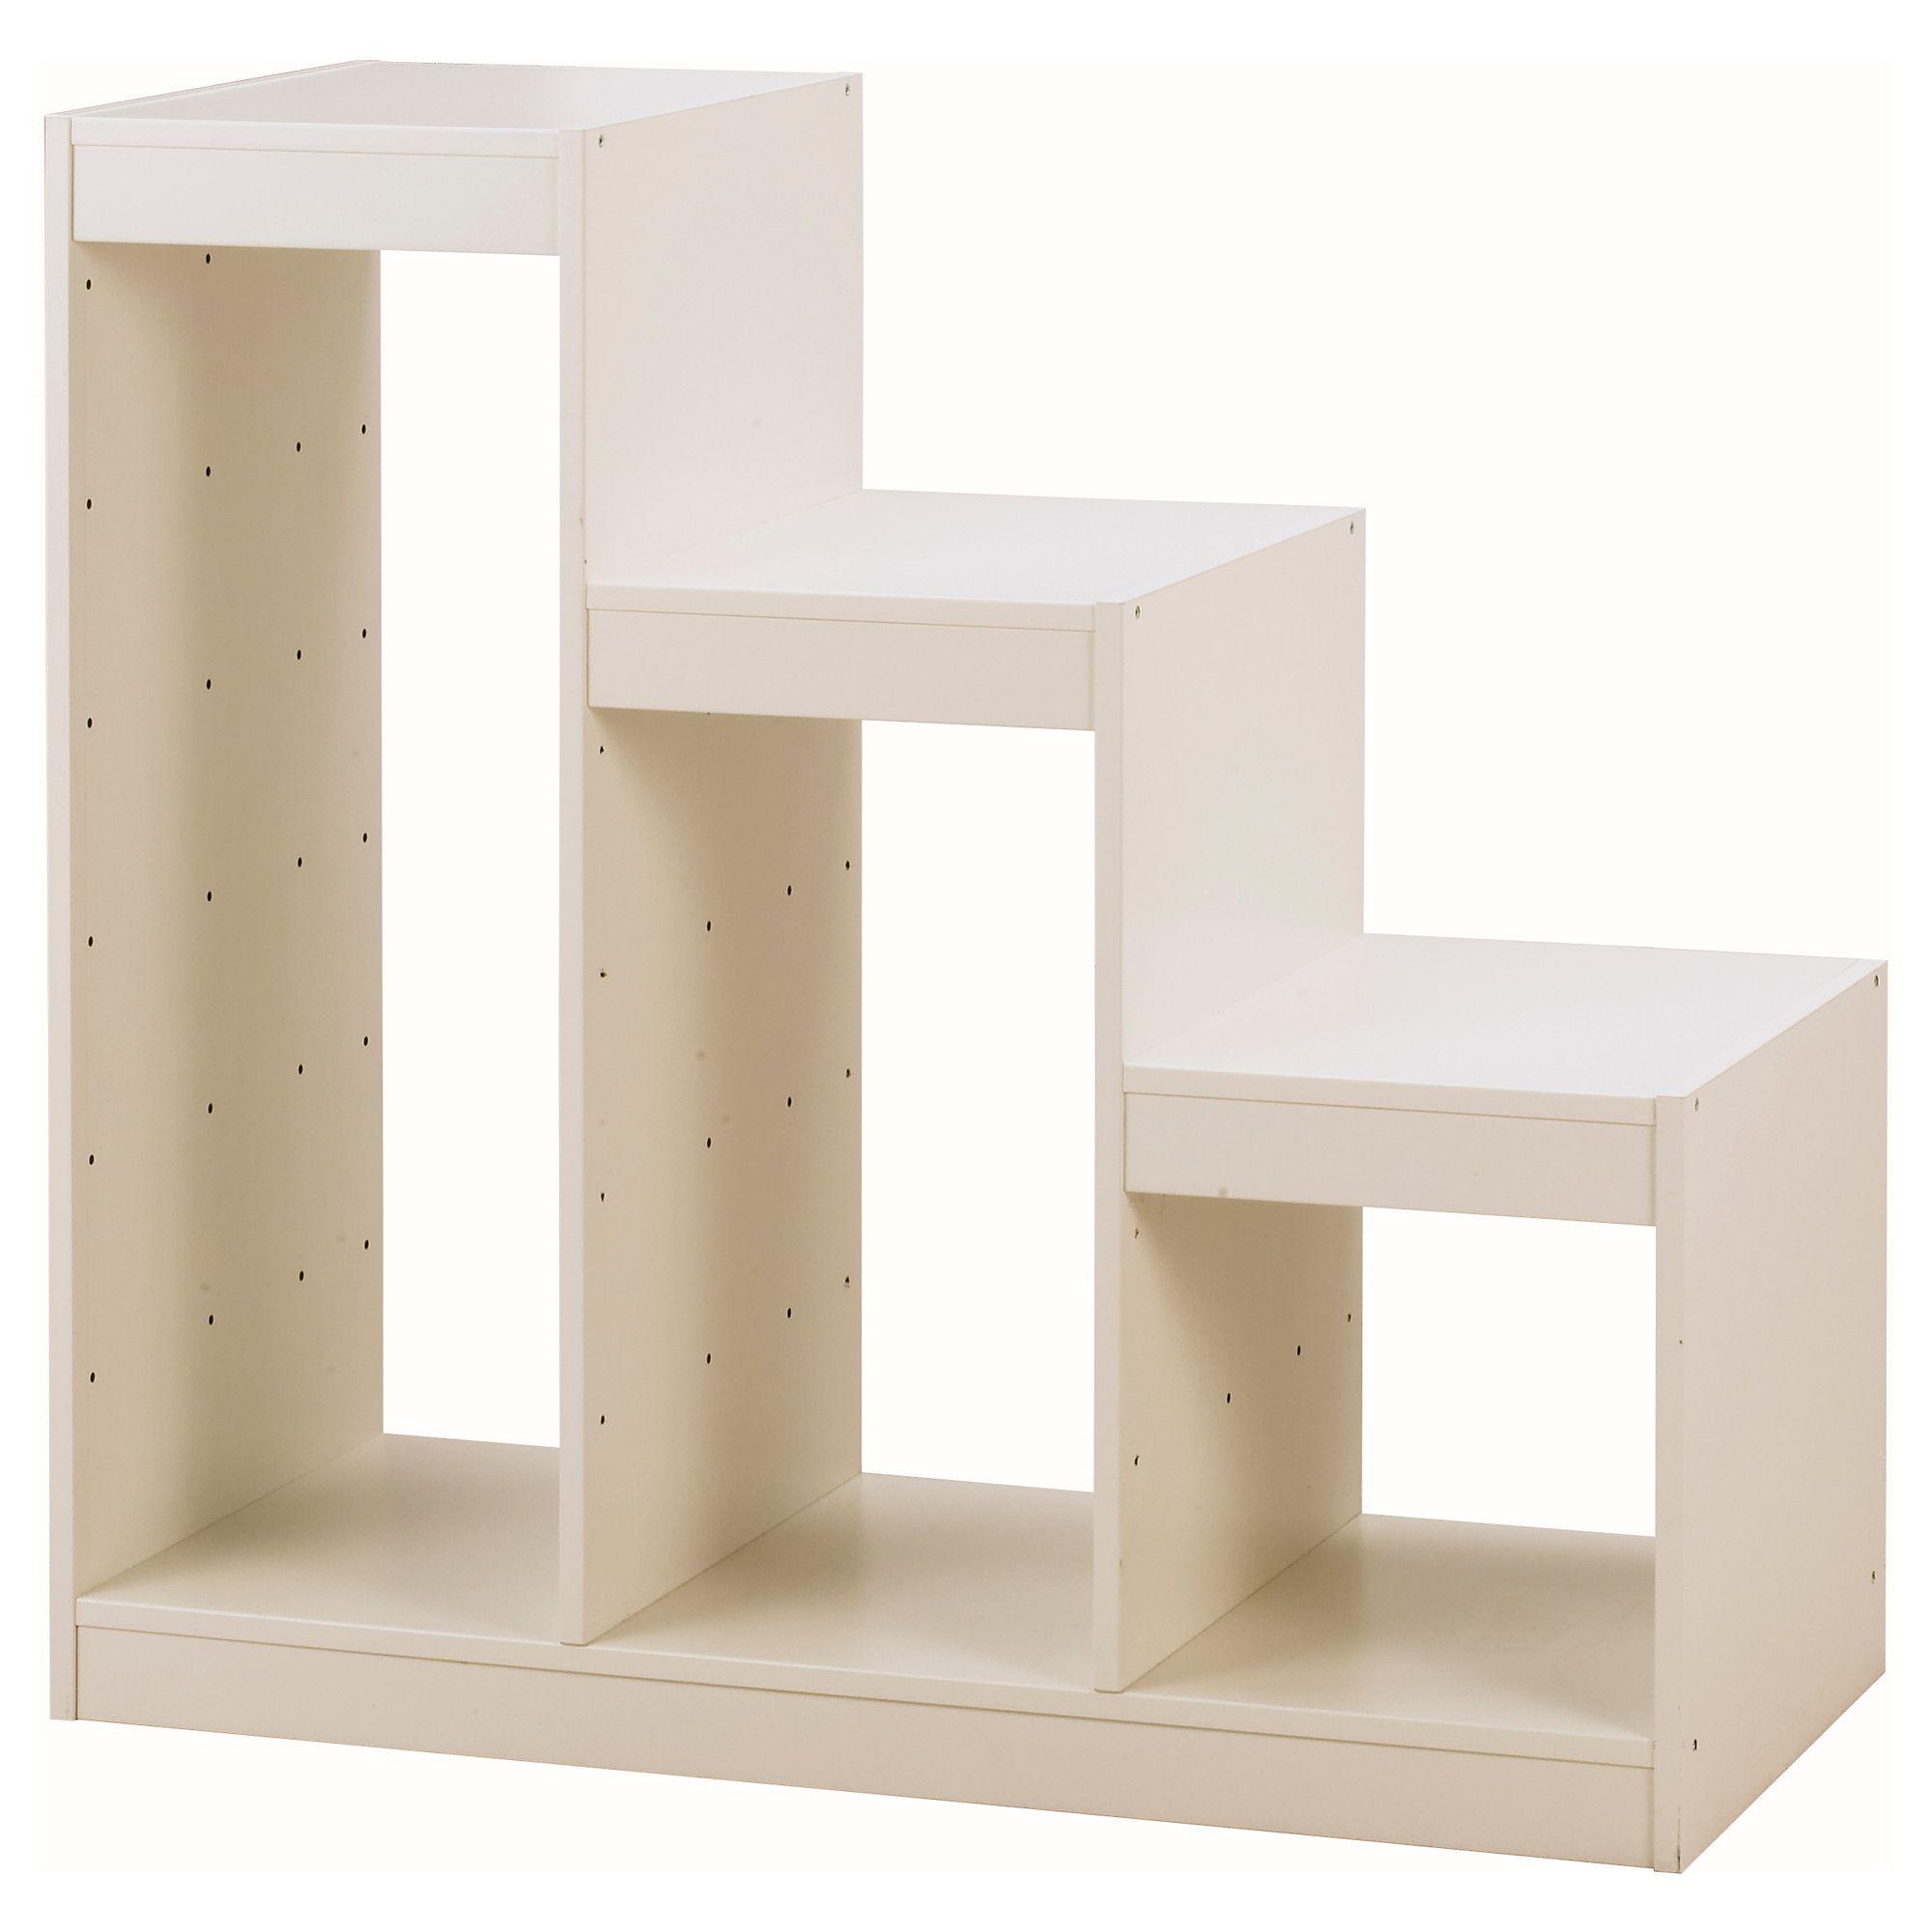 New Bookcase Toy Box White Finish Bedroom Playroom Child: IKEA - TROFAST Frame White